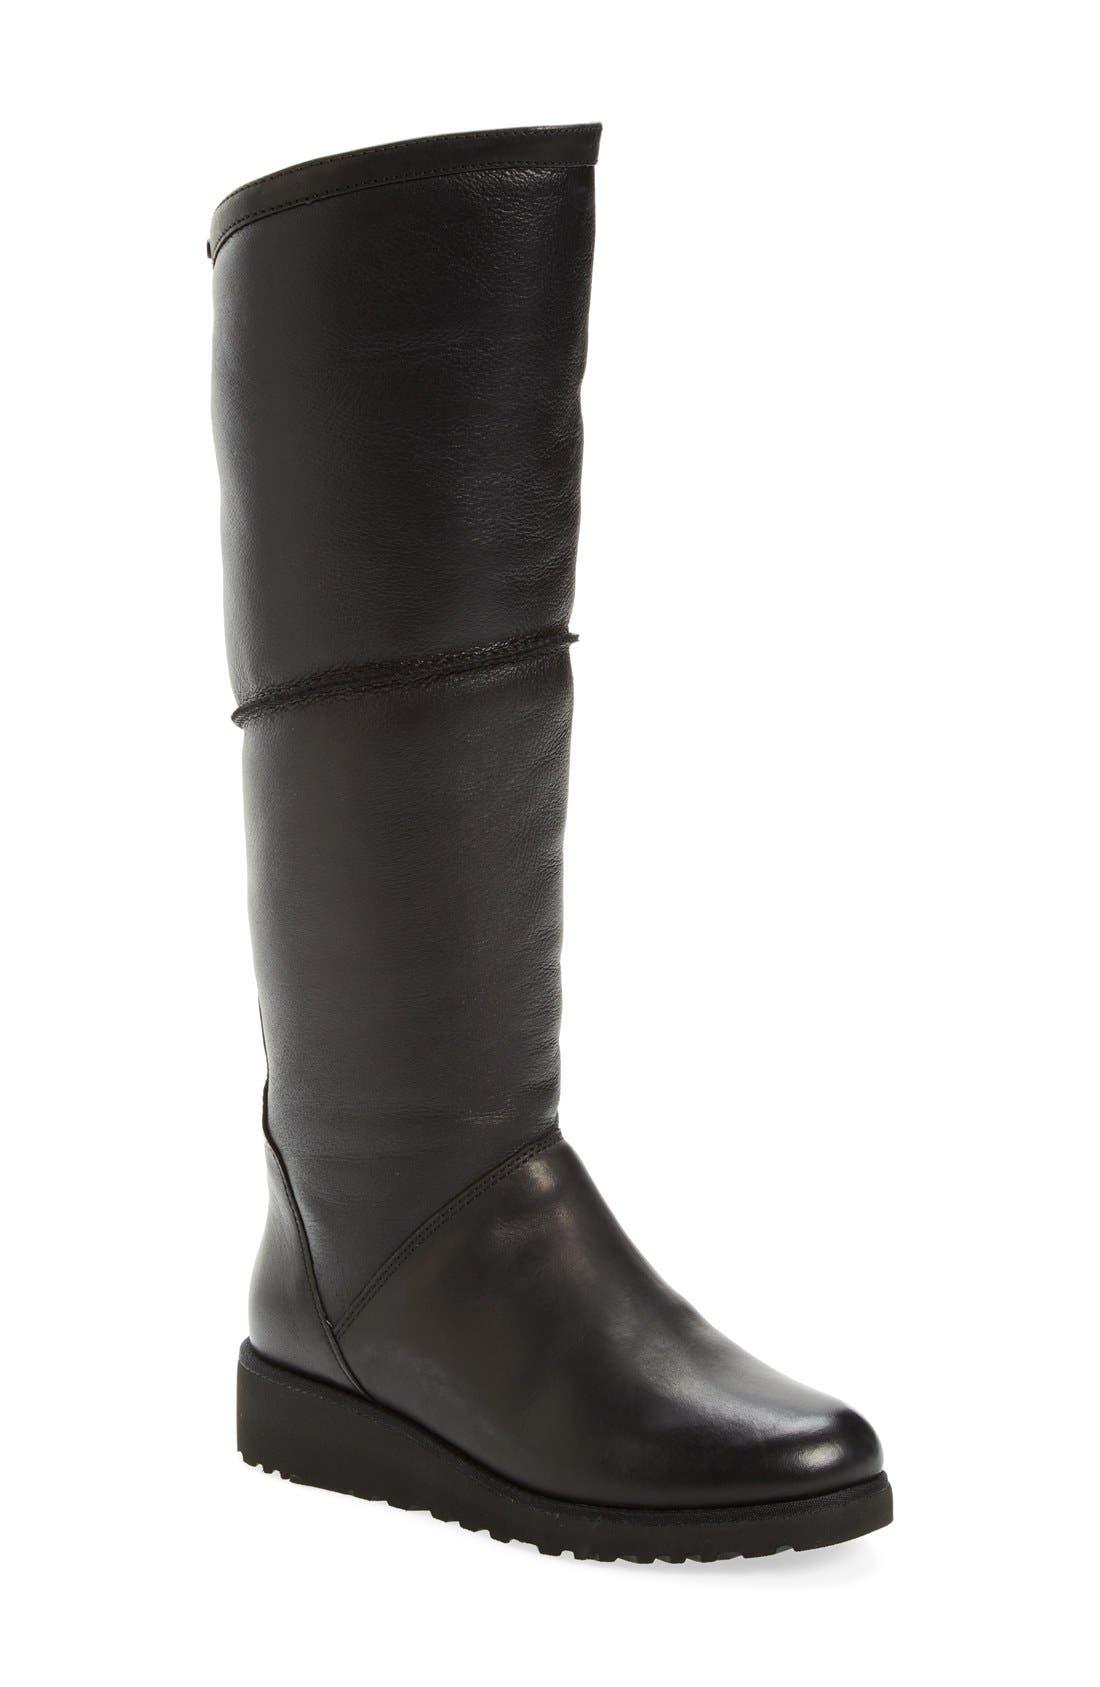 Alternate Image 1 Selected - UGG® Kendi Tall Boot (Women)